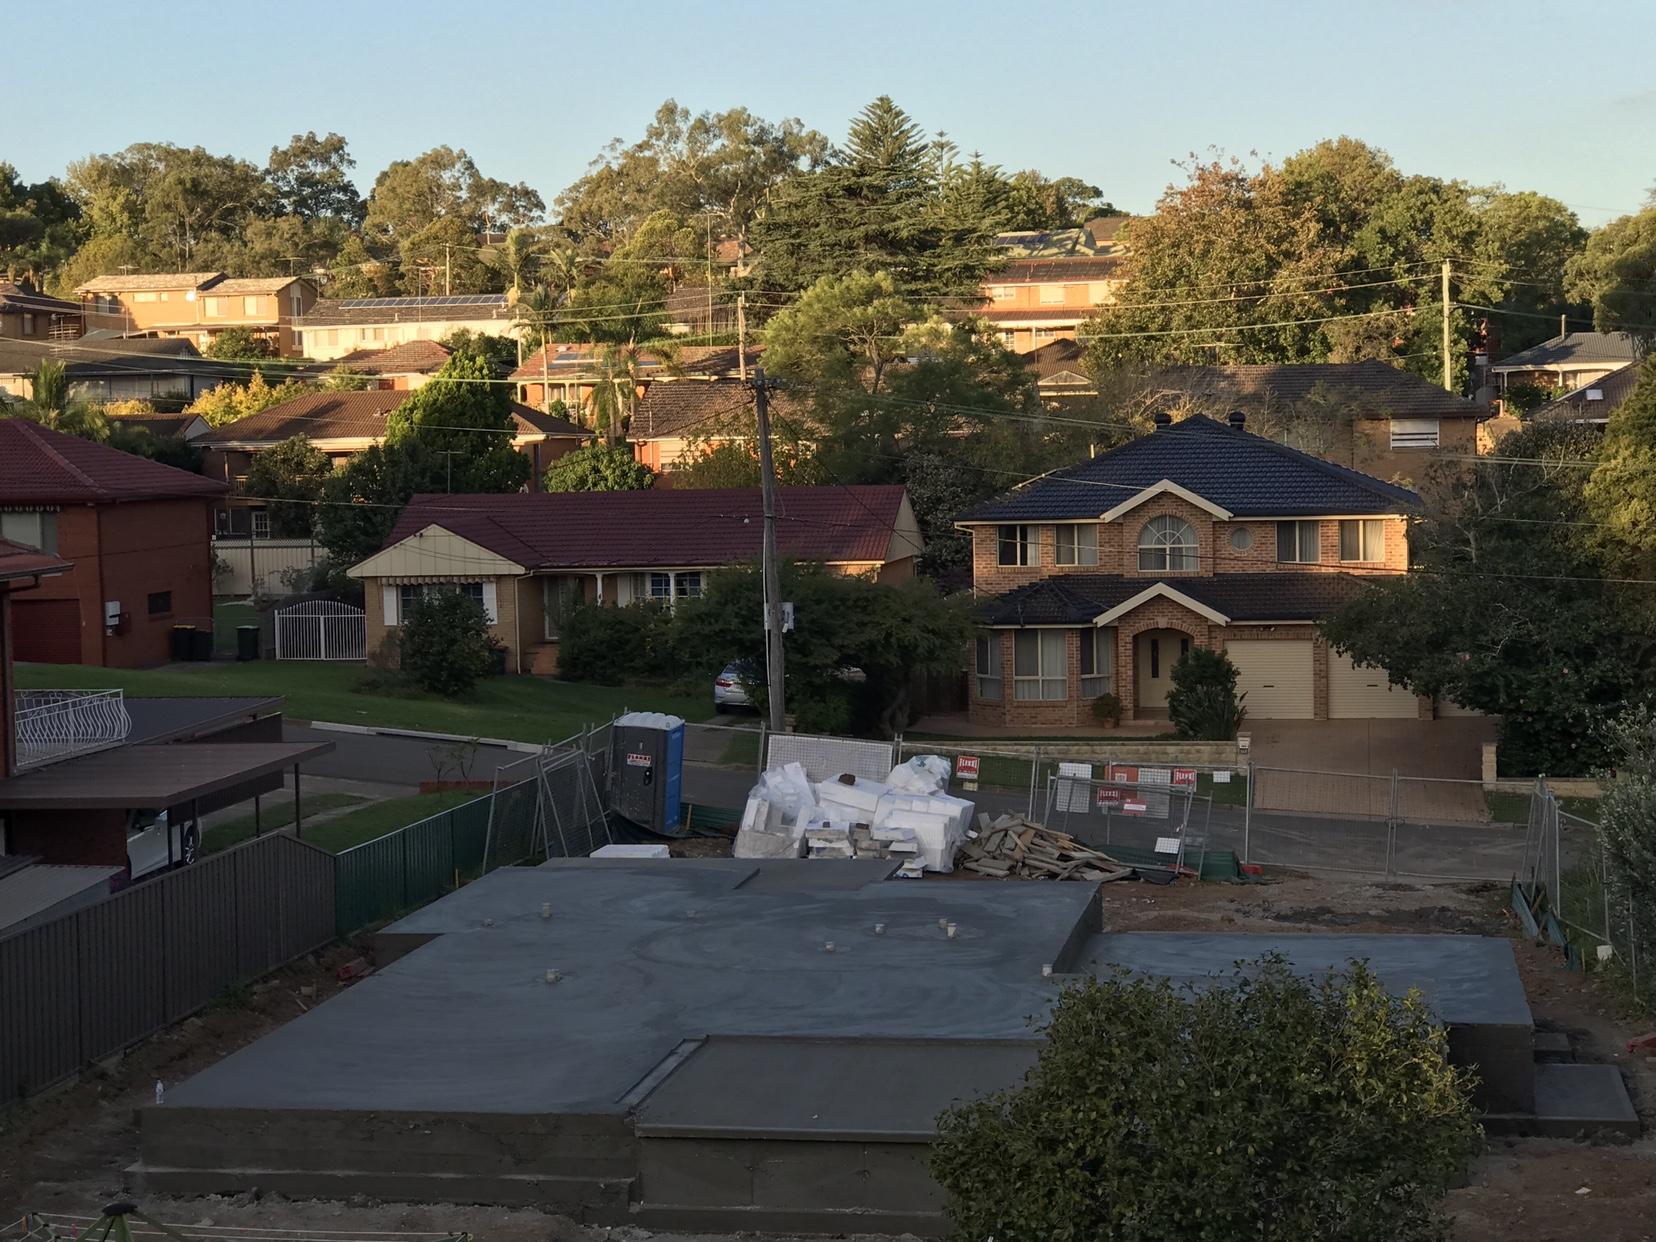 KDR RAWSON Benham 33 in hills area of Sydney